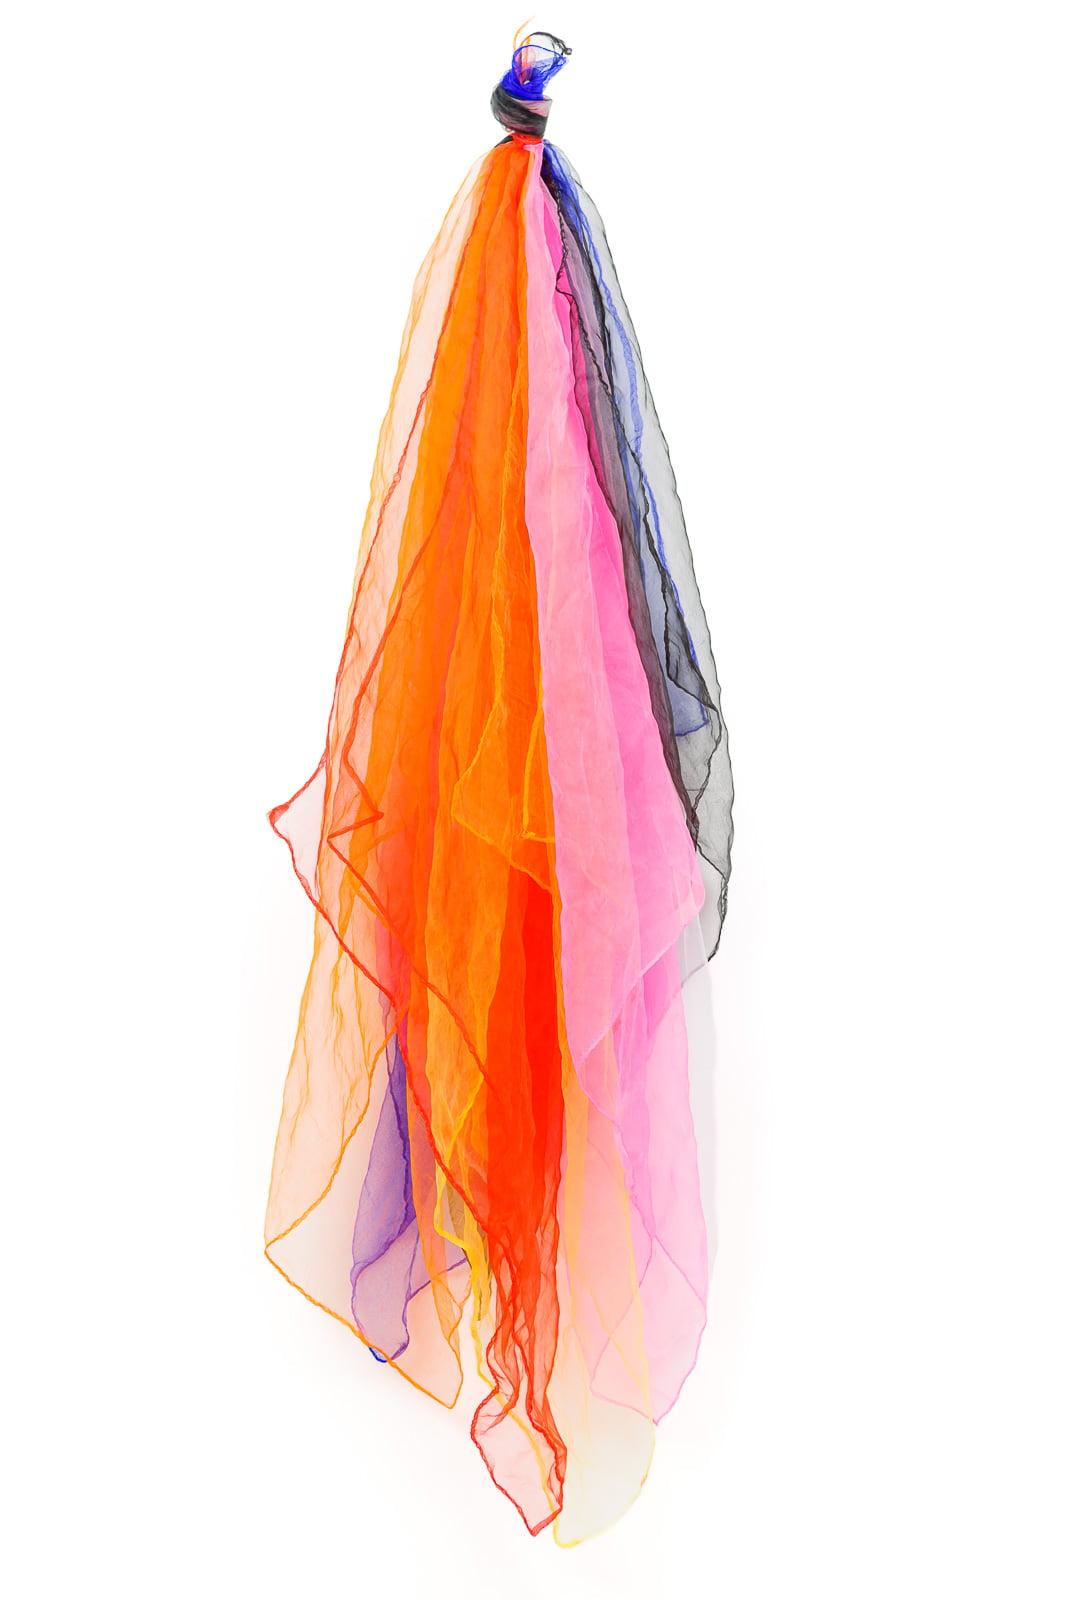 dance/sensory scarves